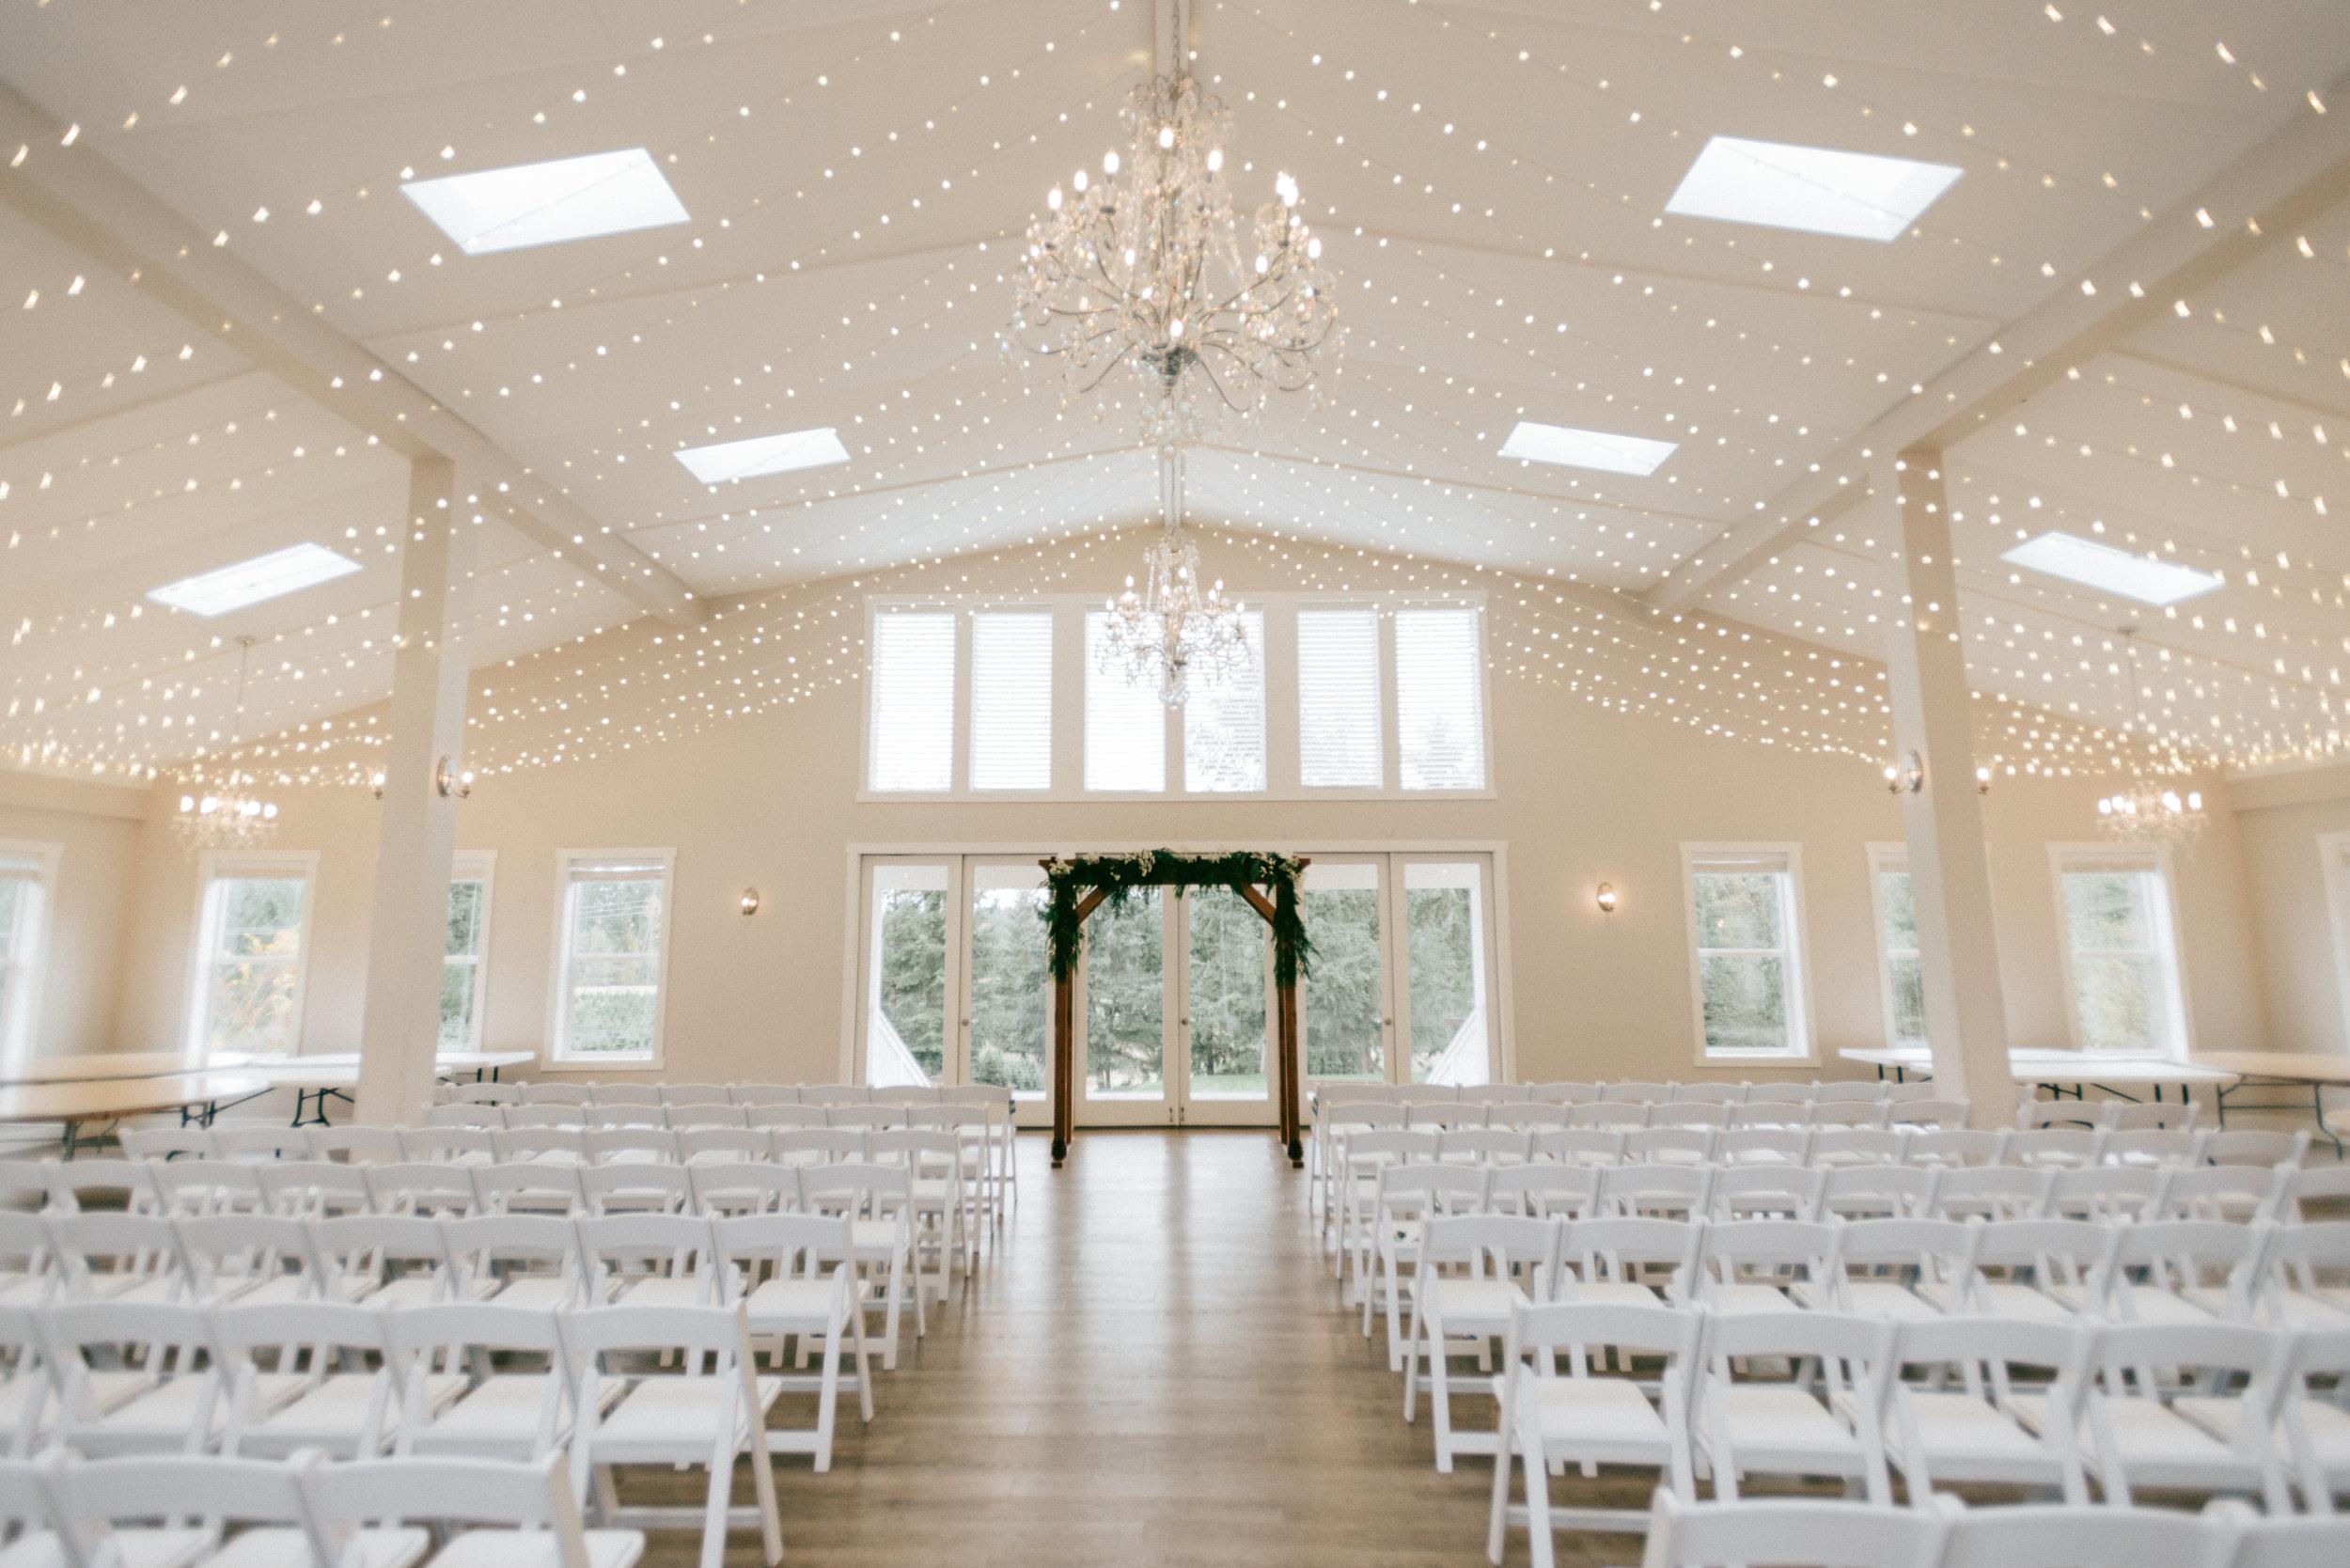 dan-hannah-wedding-first-look-3077.jpg